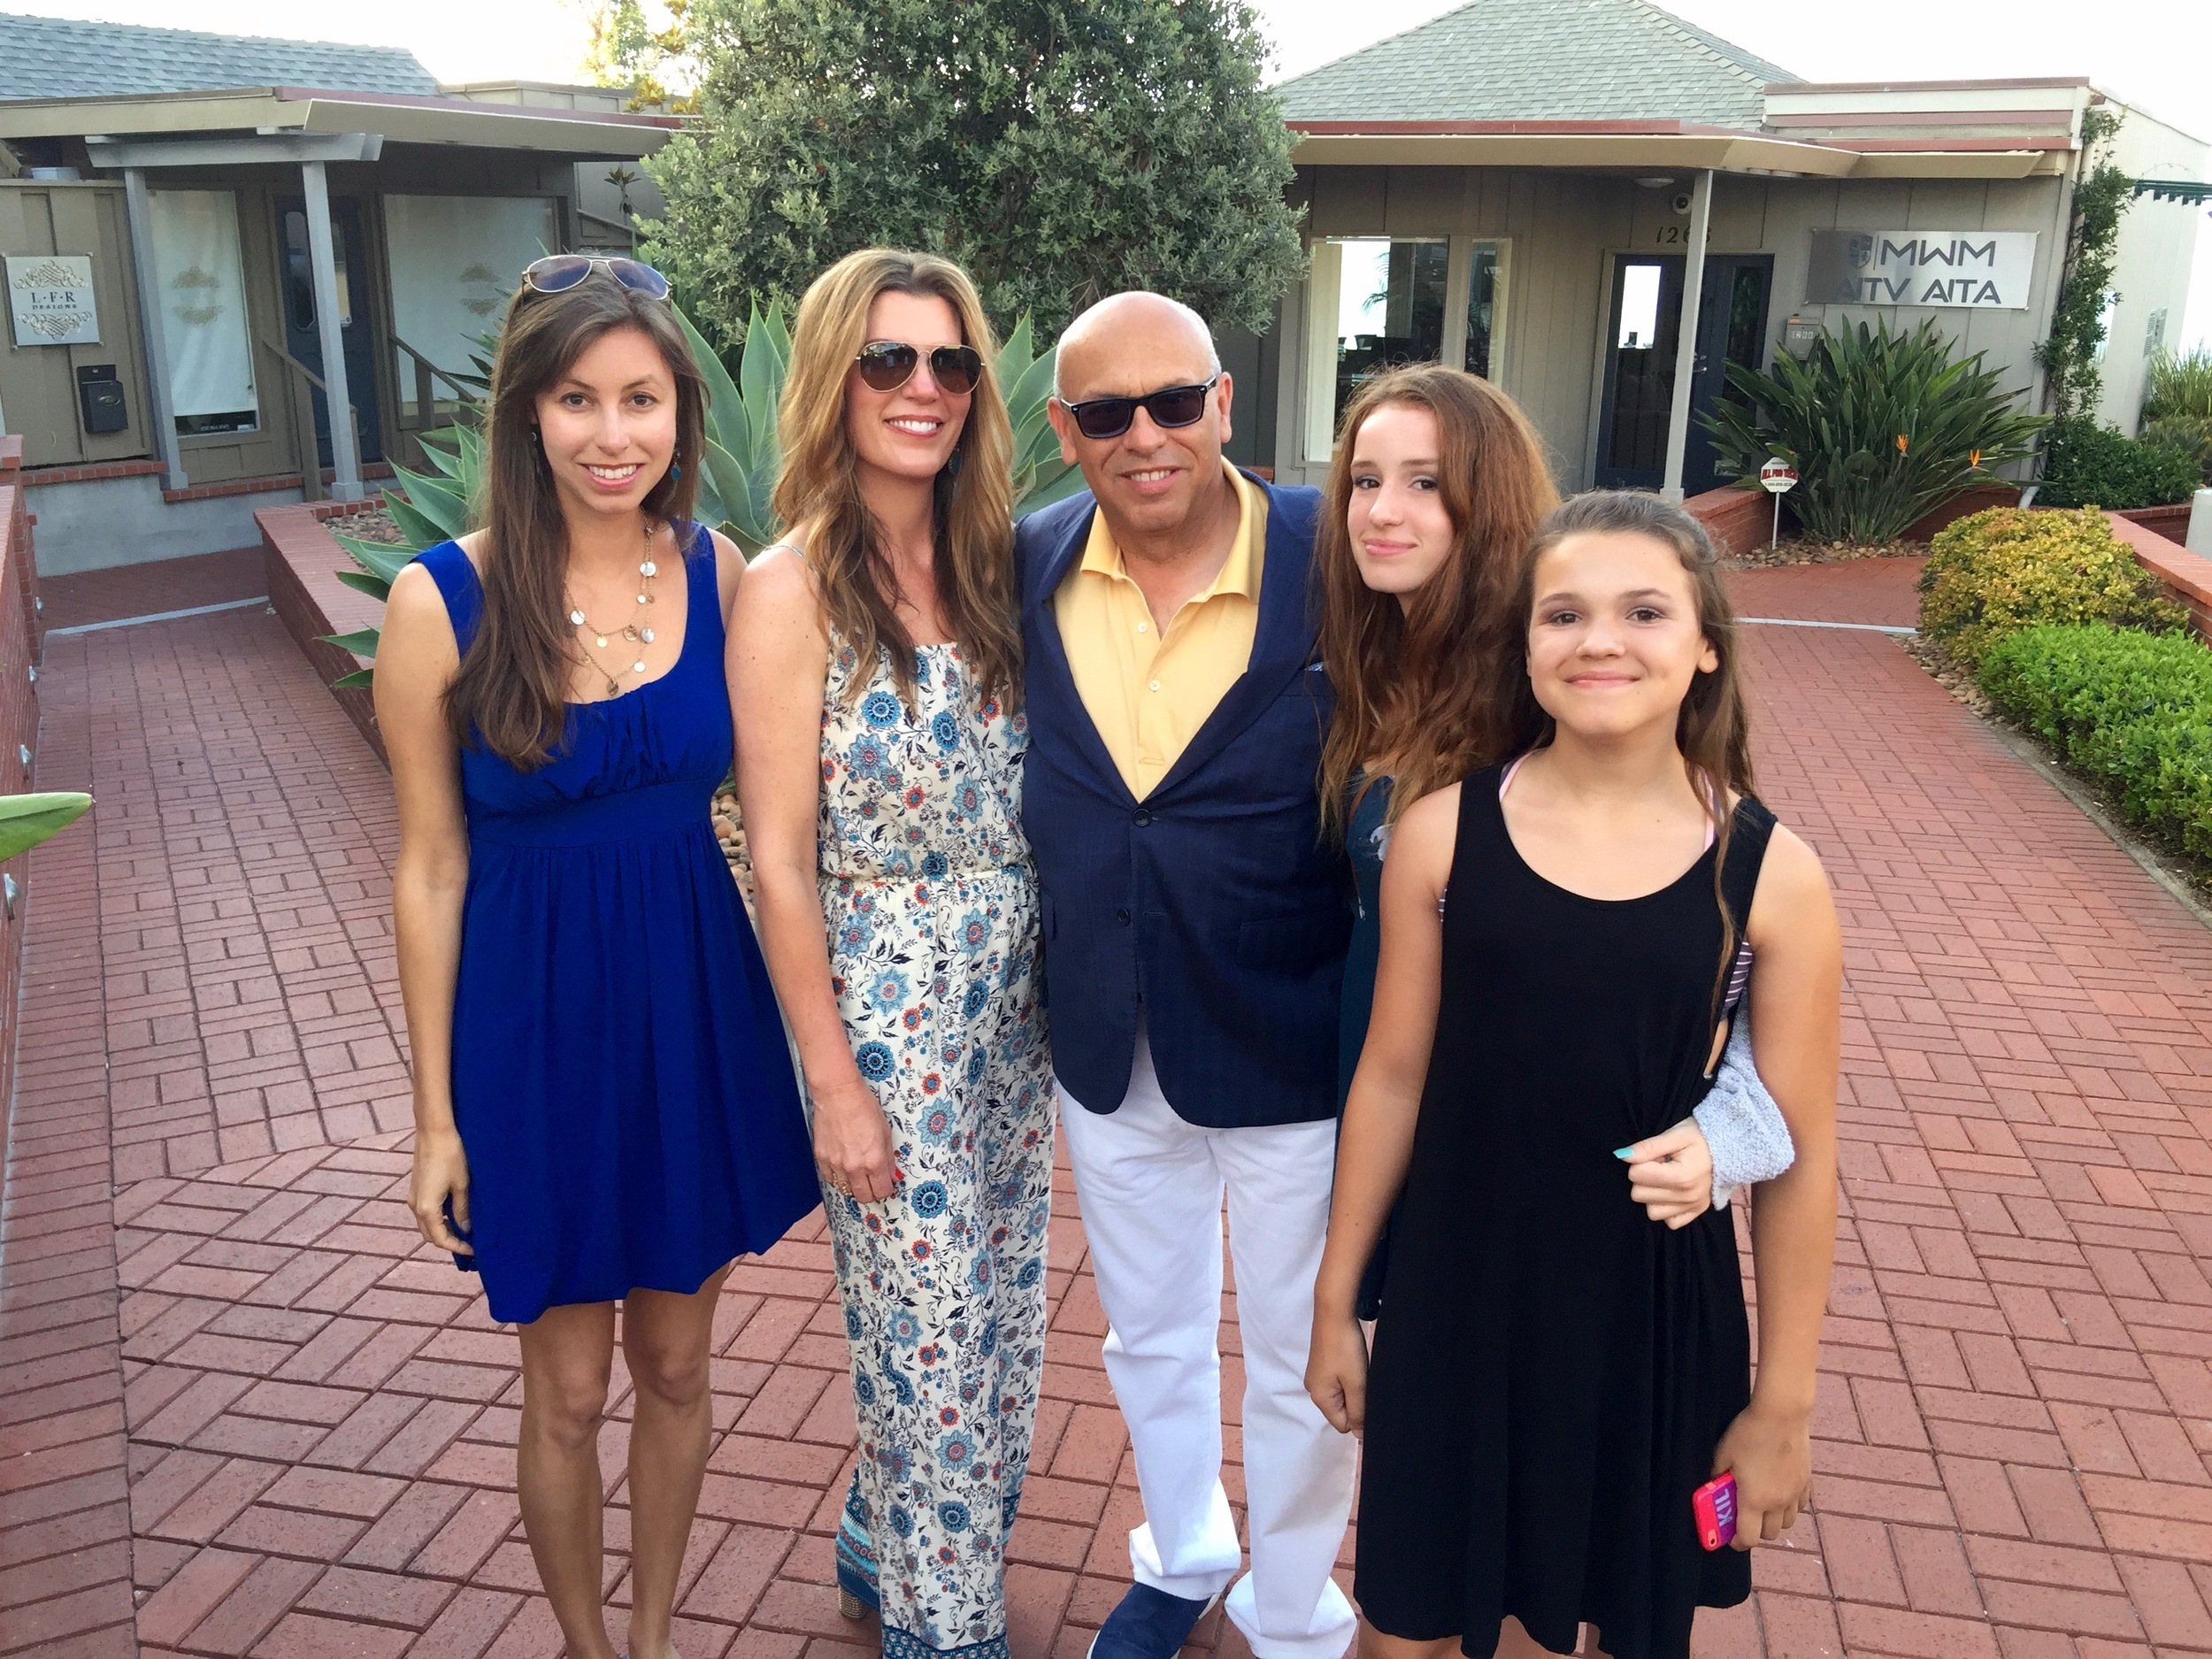 Tiffany, Isabel, MC, Bella and Sophia at Eddie V's.